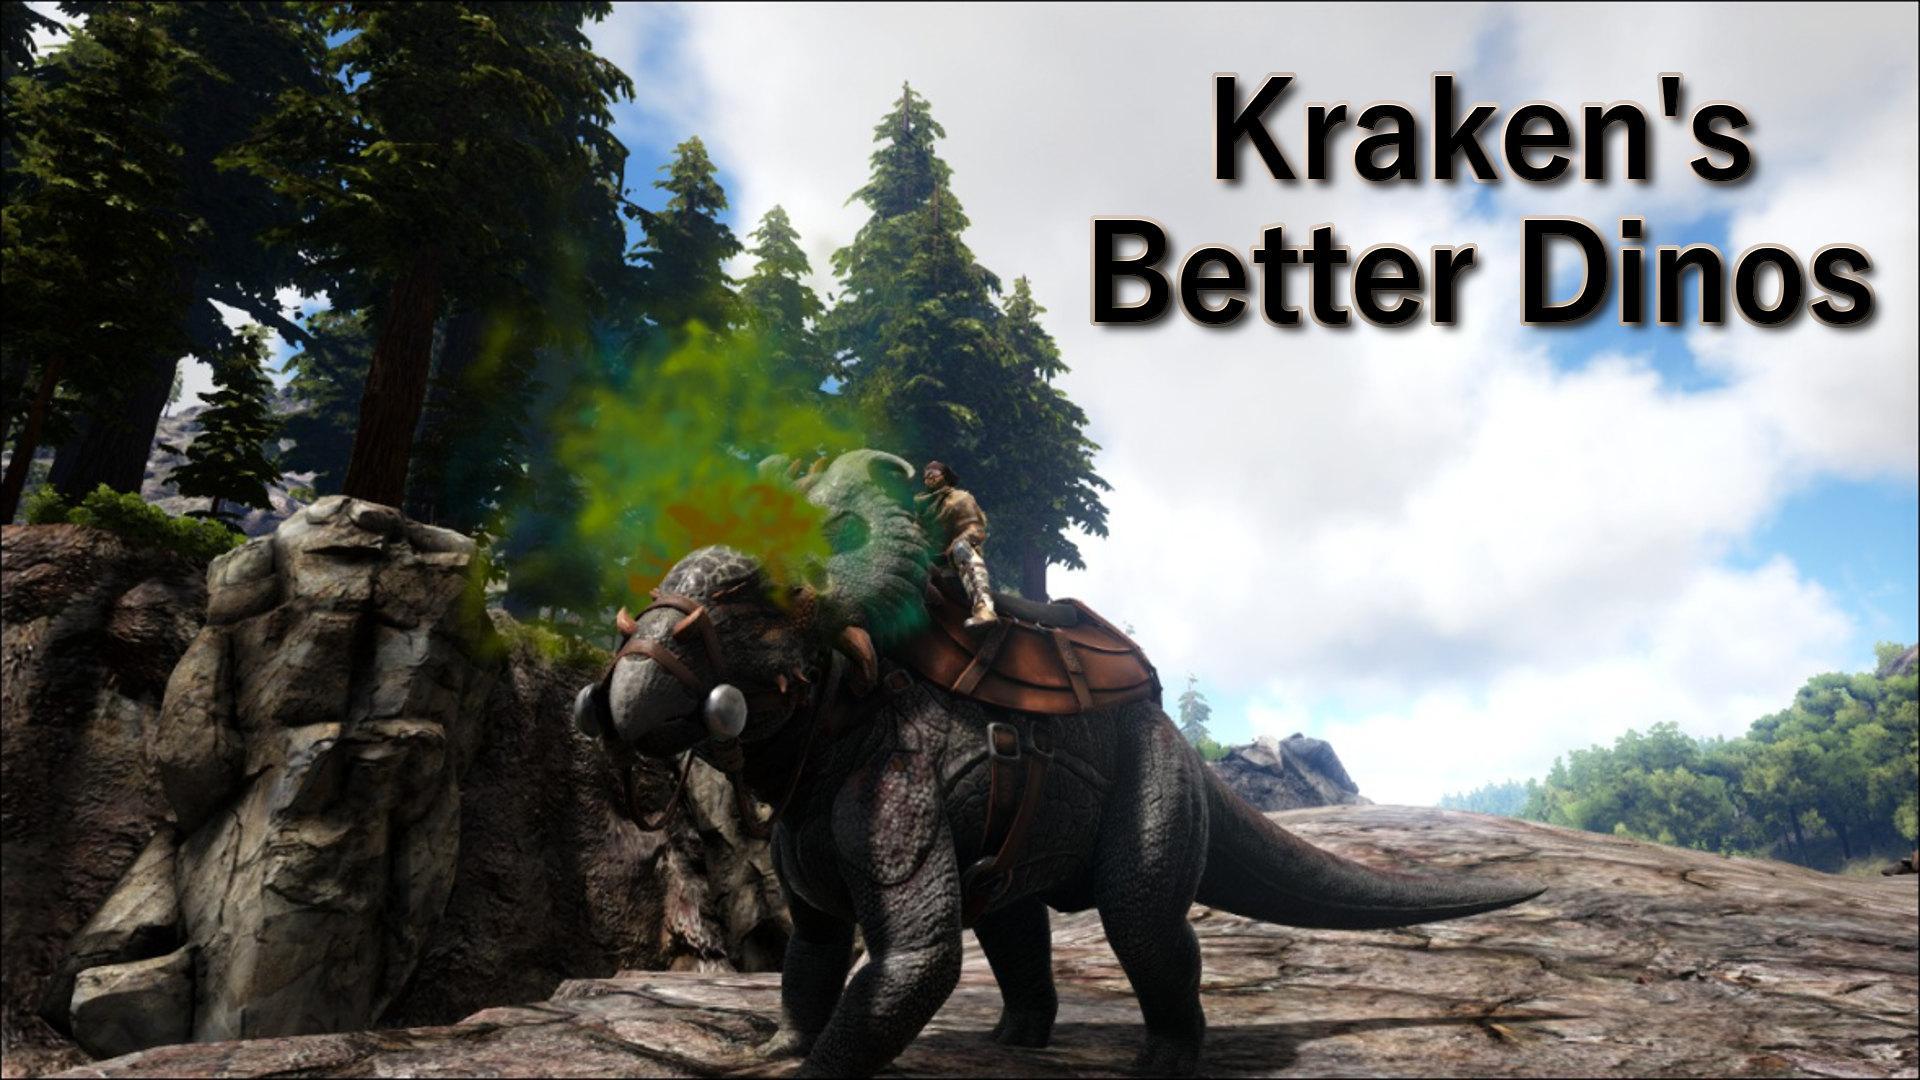 Kraken's Better Dinos - ARK - Official Community Forums